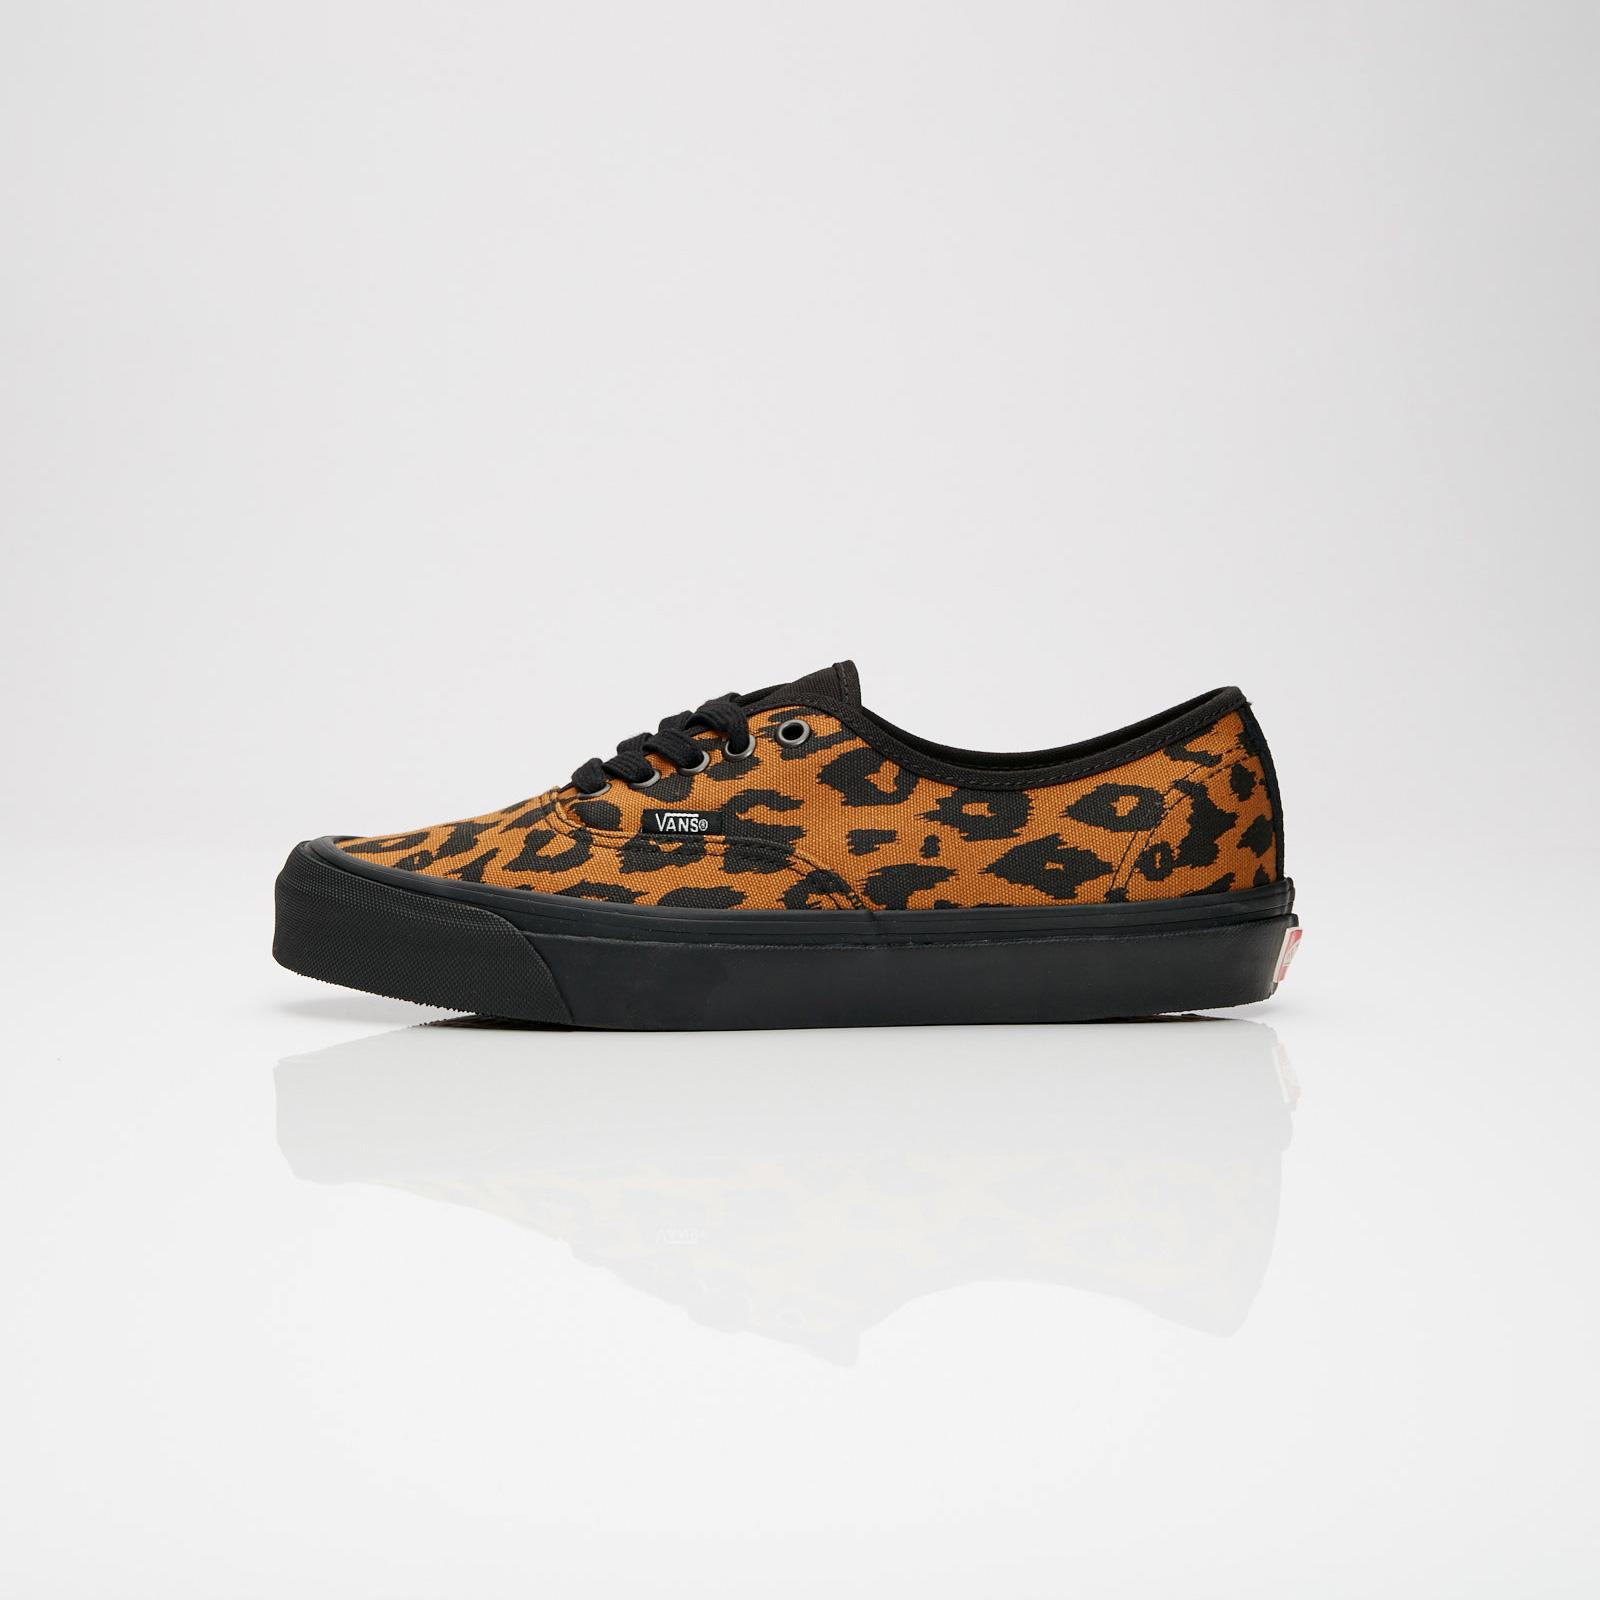 0b7fbb93cf Vans UA OG Authentic LX - V00uddu9m - Sneakersnstuff